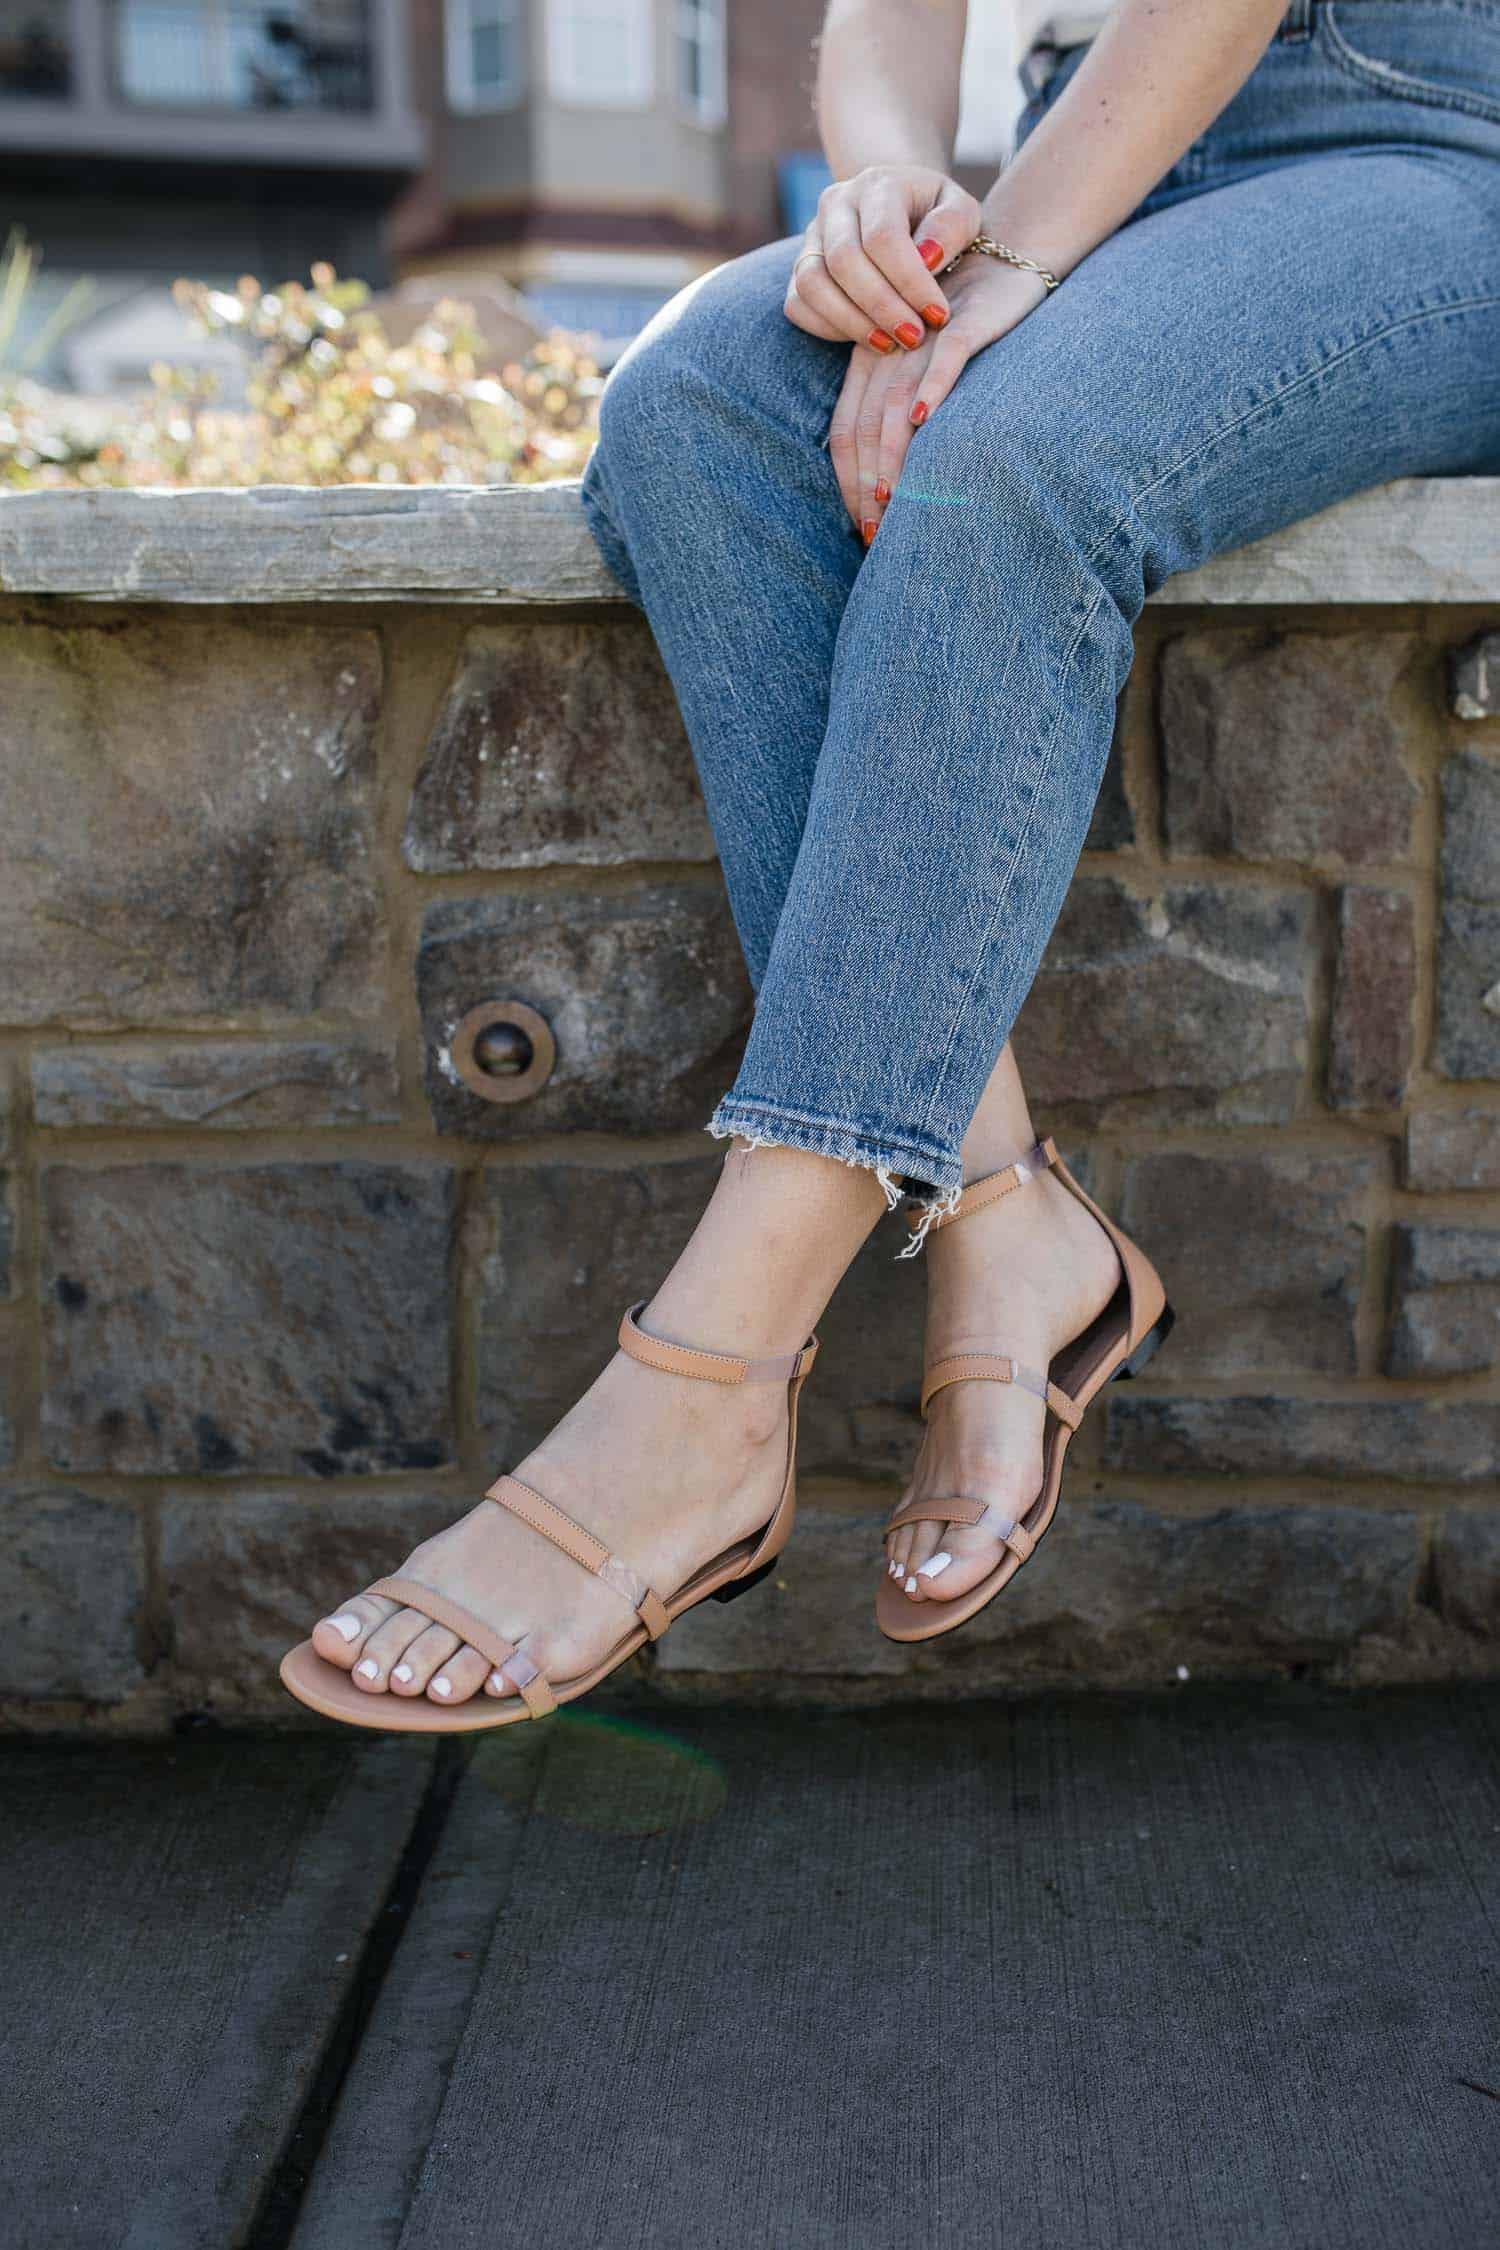 Tamara Mellon Frontline Sandals Review